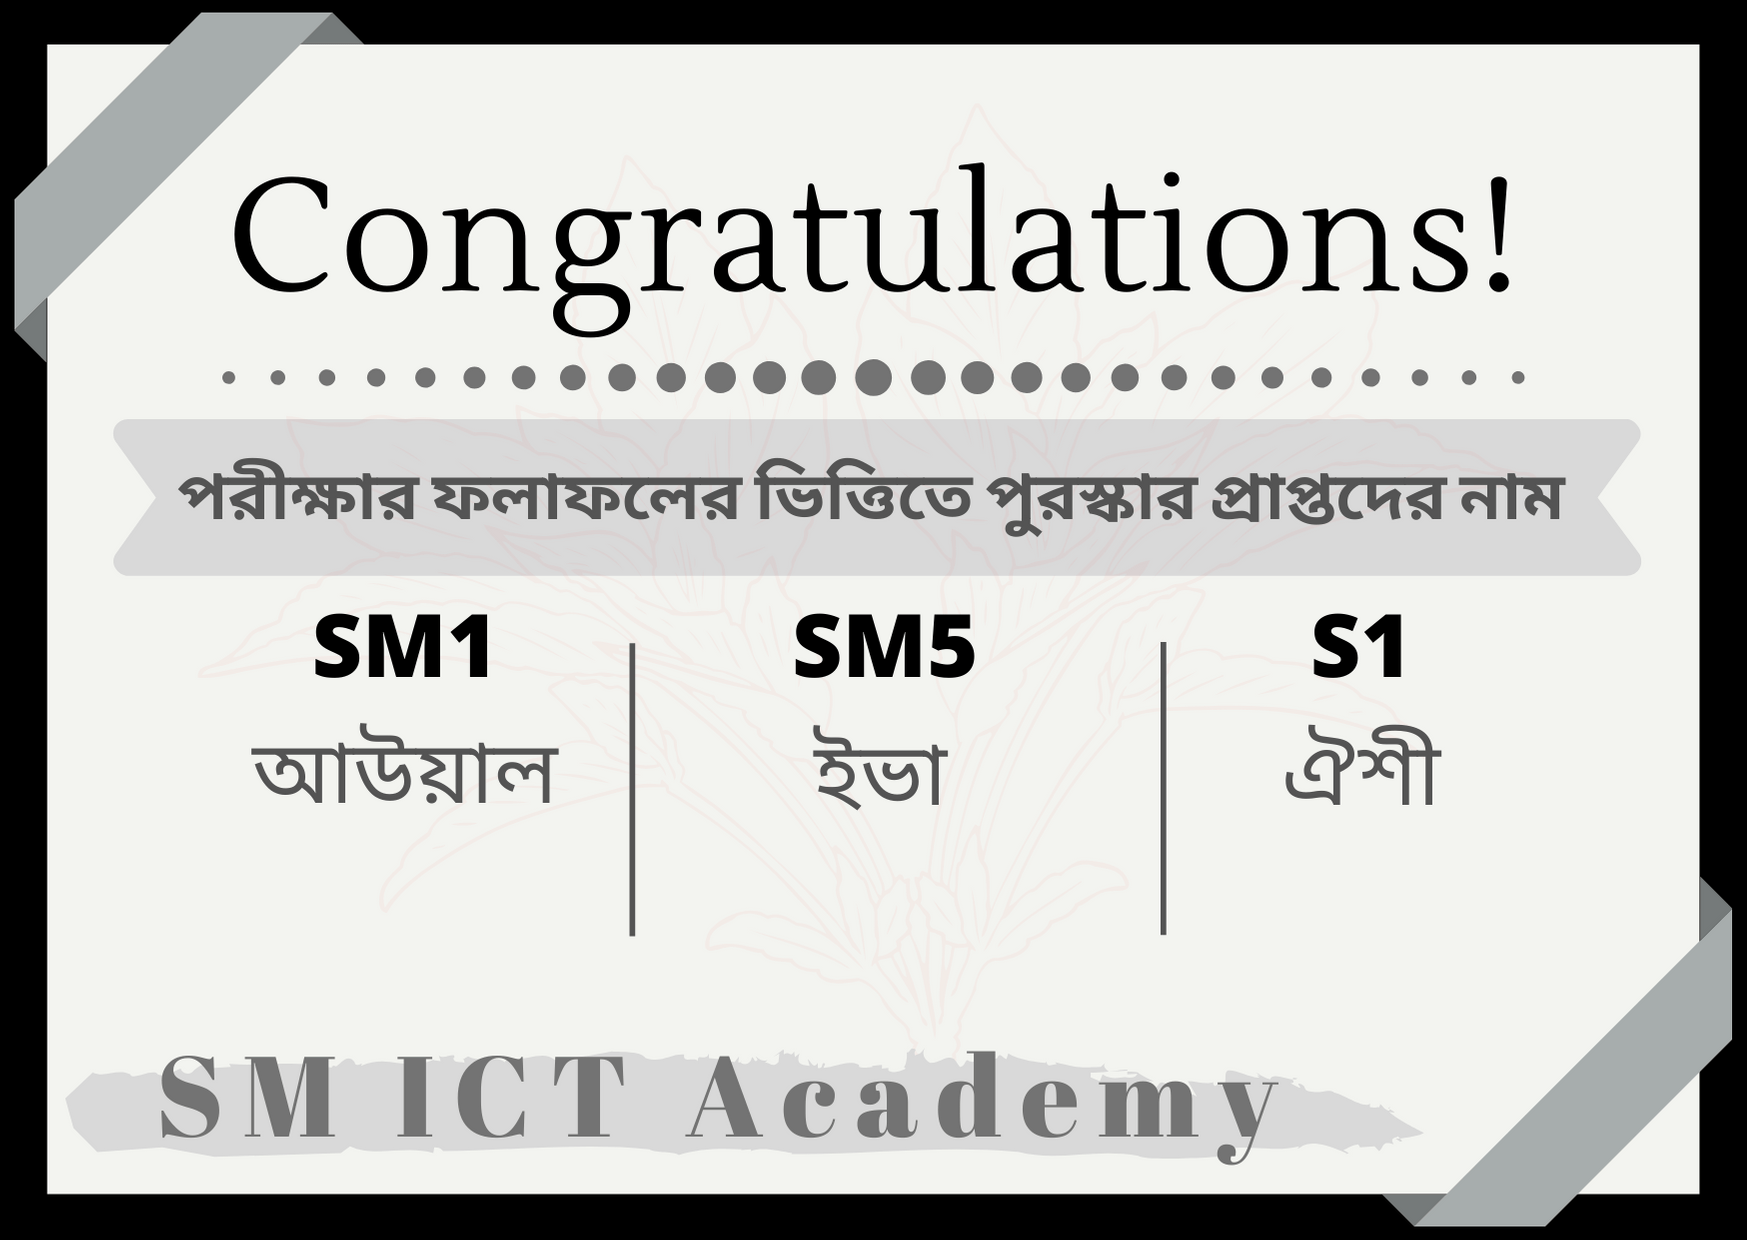 SM ICT Academy result